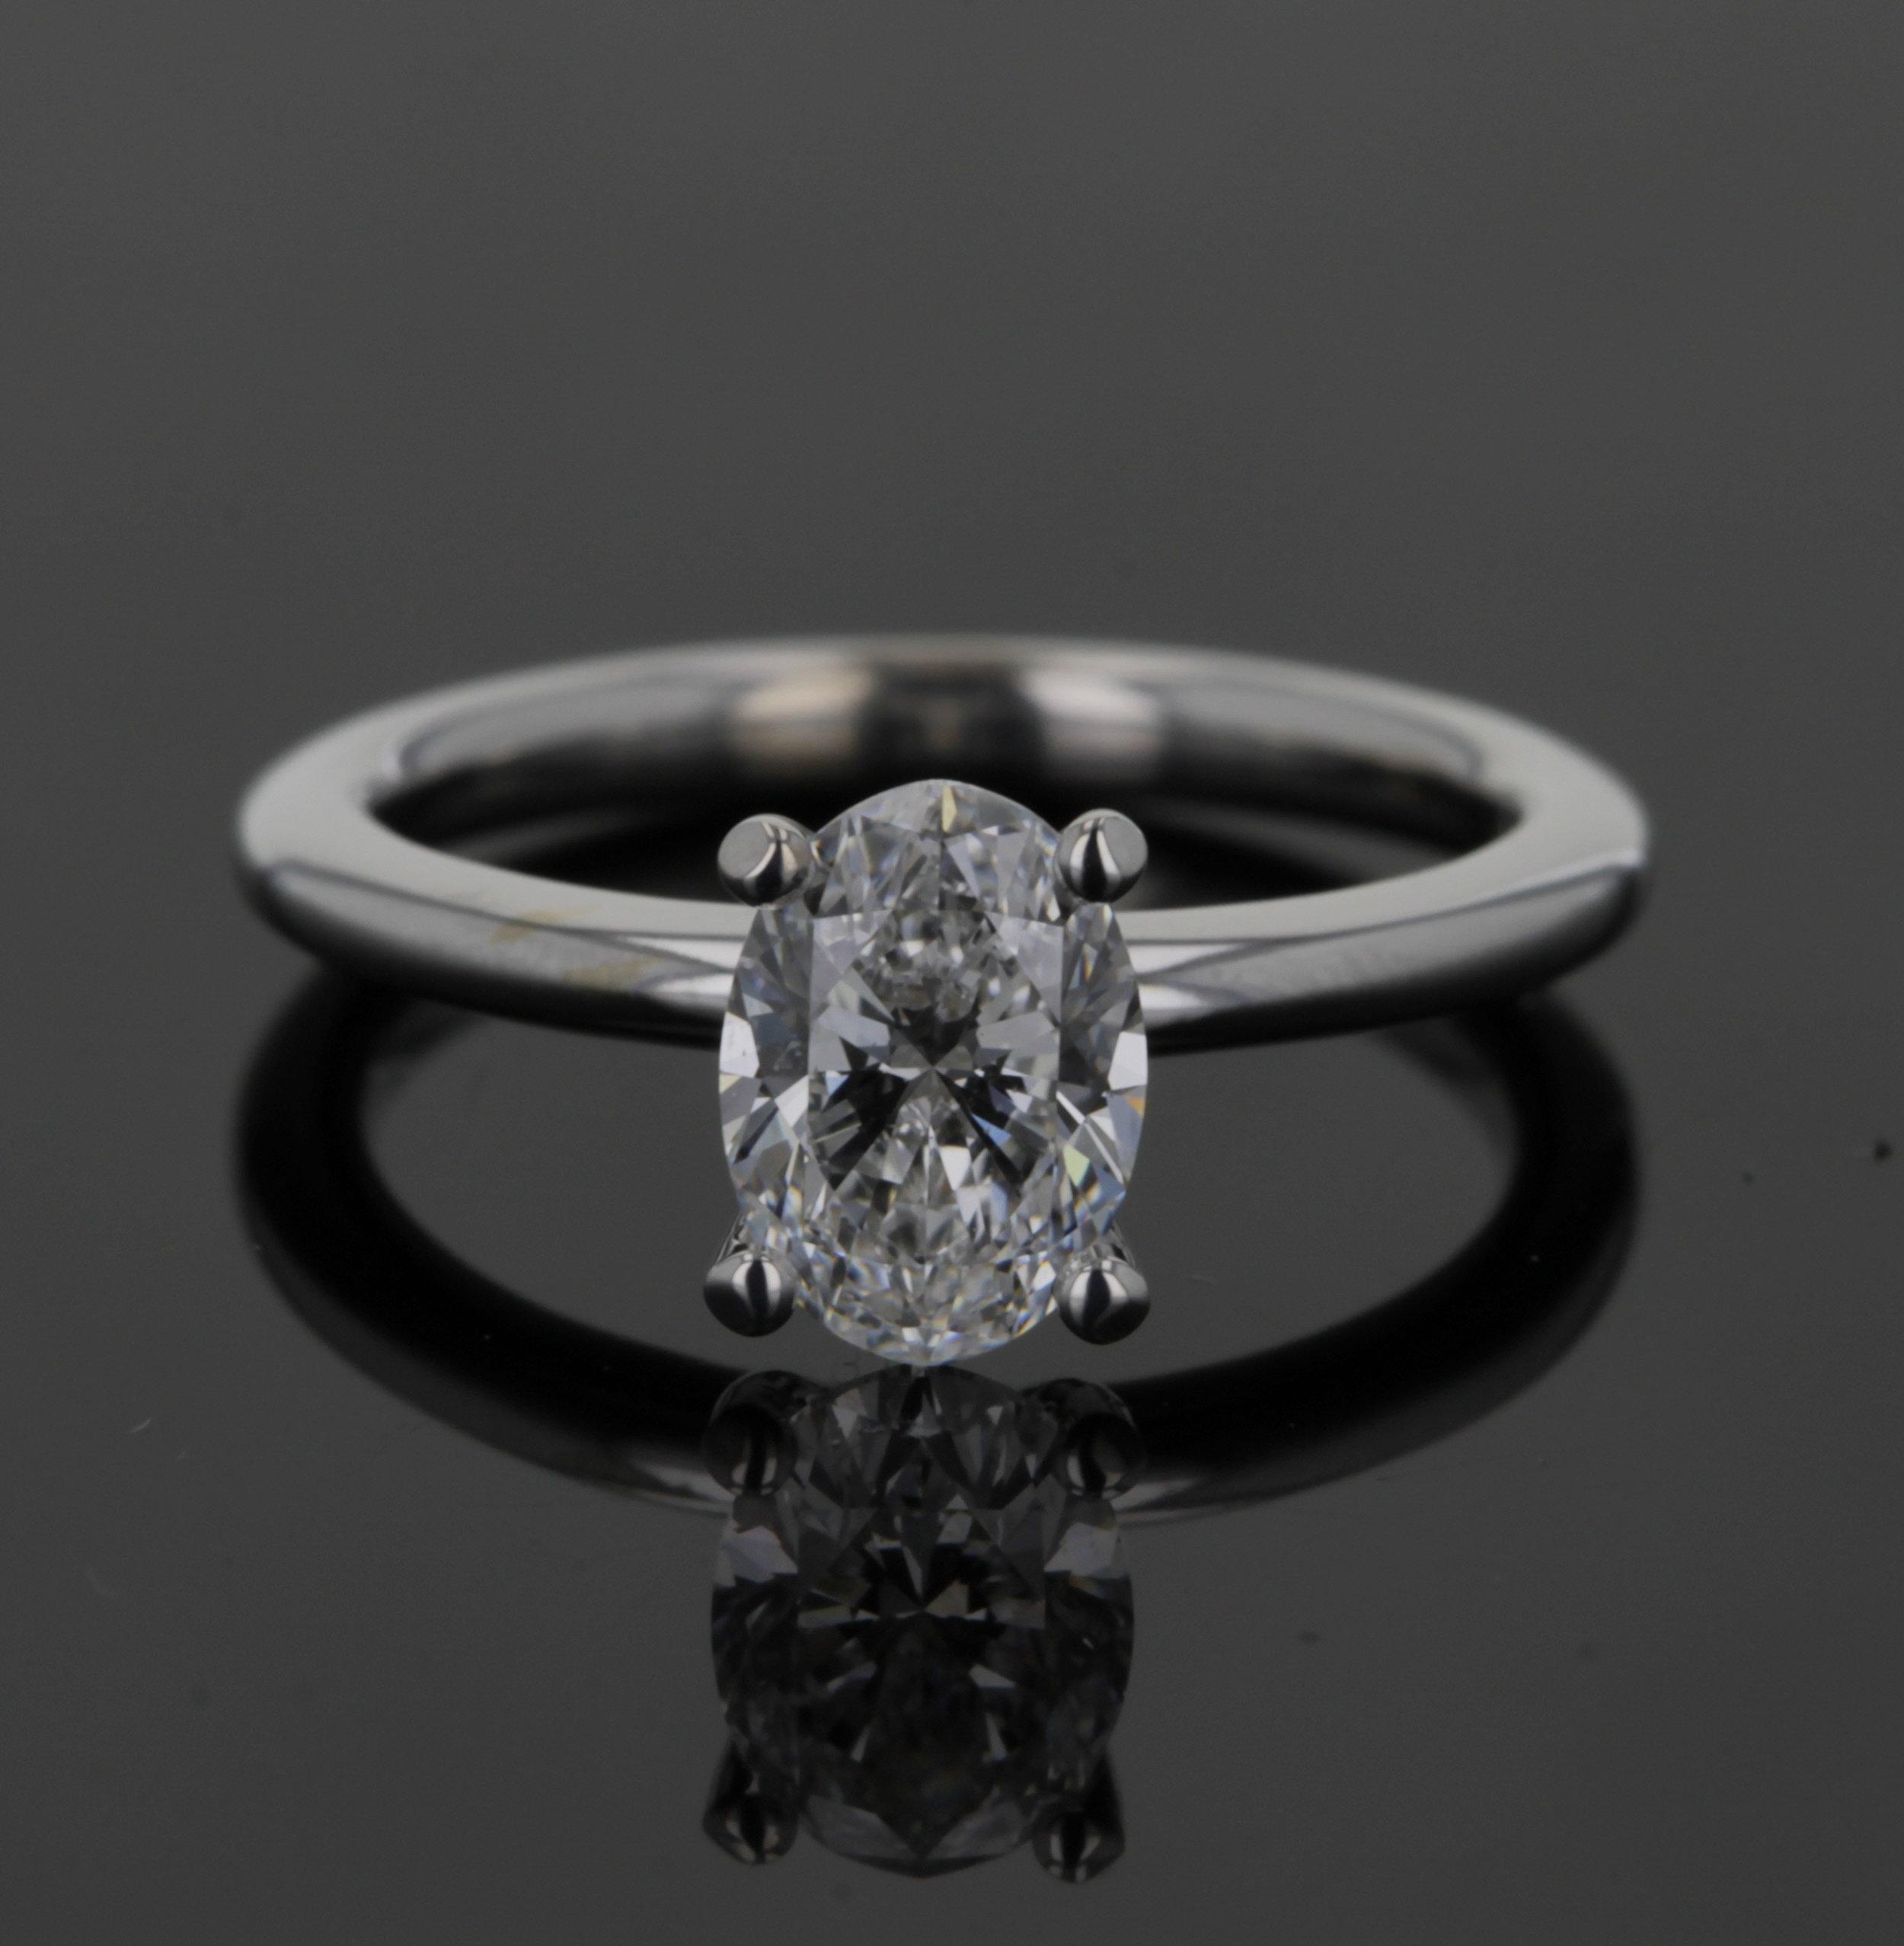 custom_solitaire_oval_engagement_ring.jpg